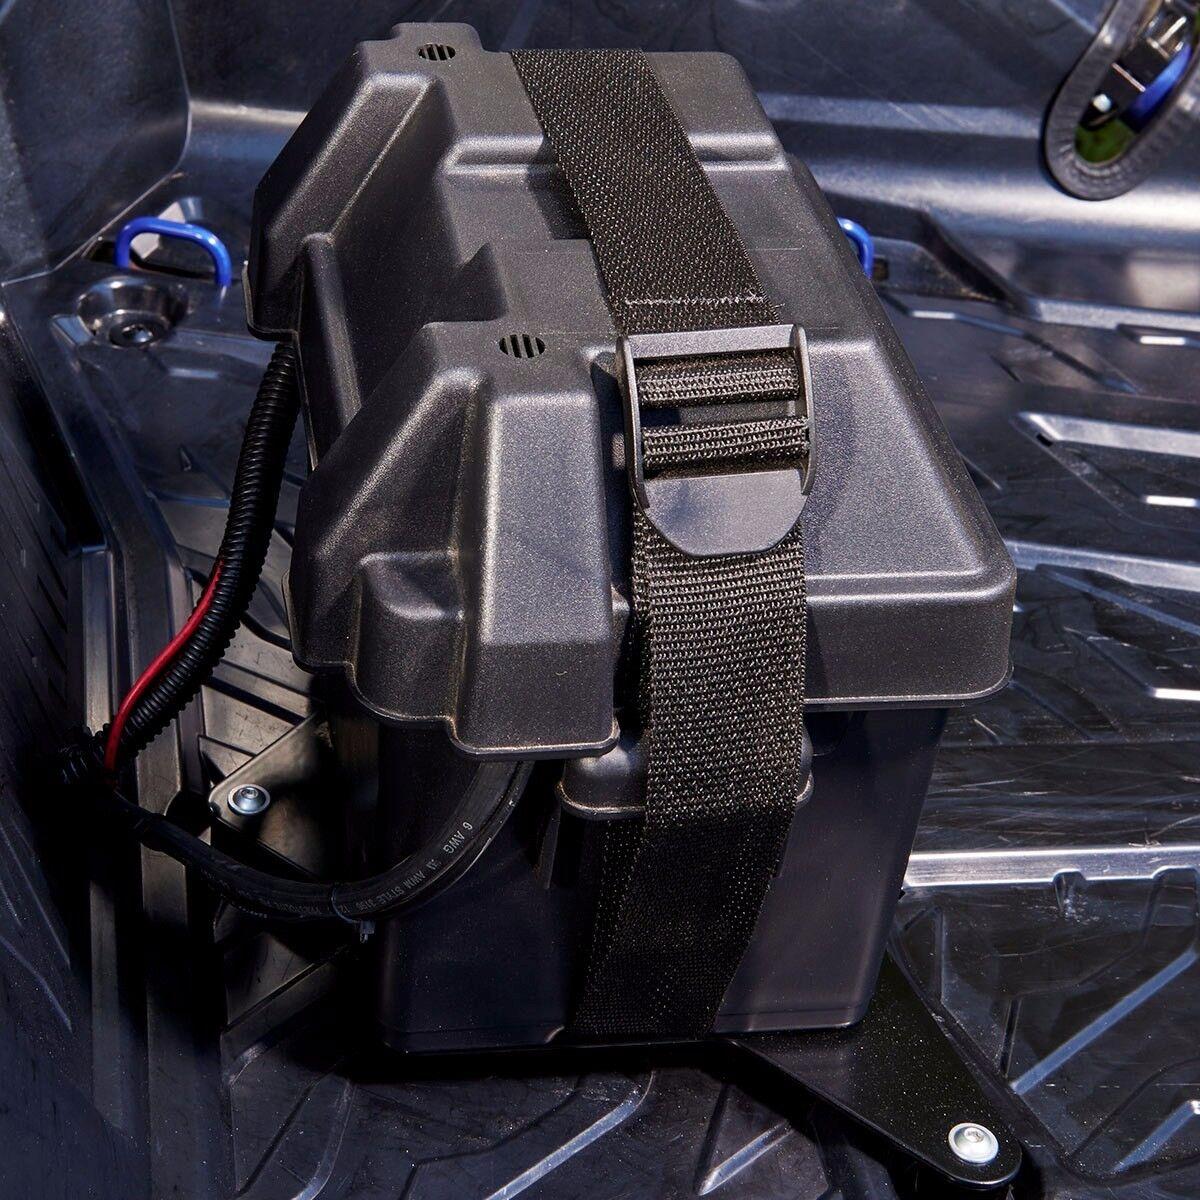 YAMAHA YXZ1000R OEM 2nd Battery Kit Wiring Acc 2016-2017 NEW 2HC-H21B0-V0-00